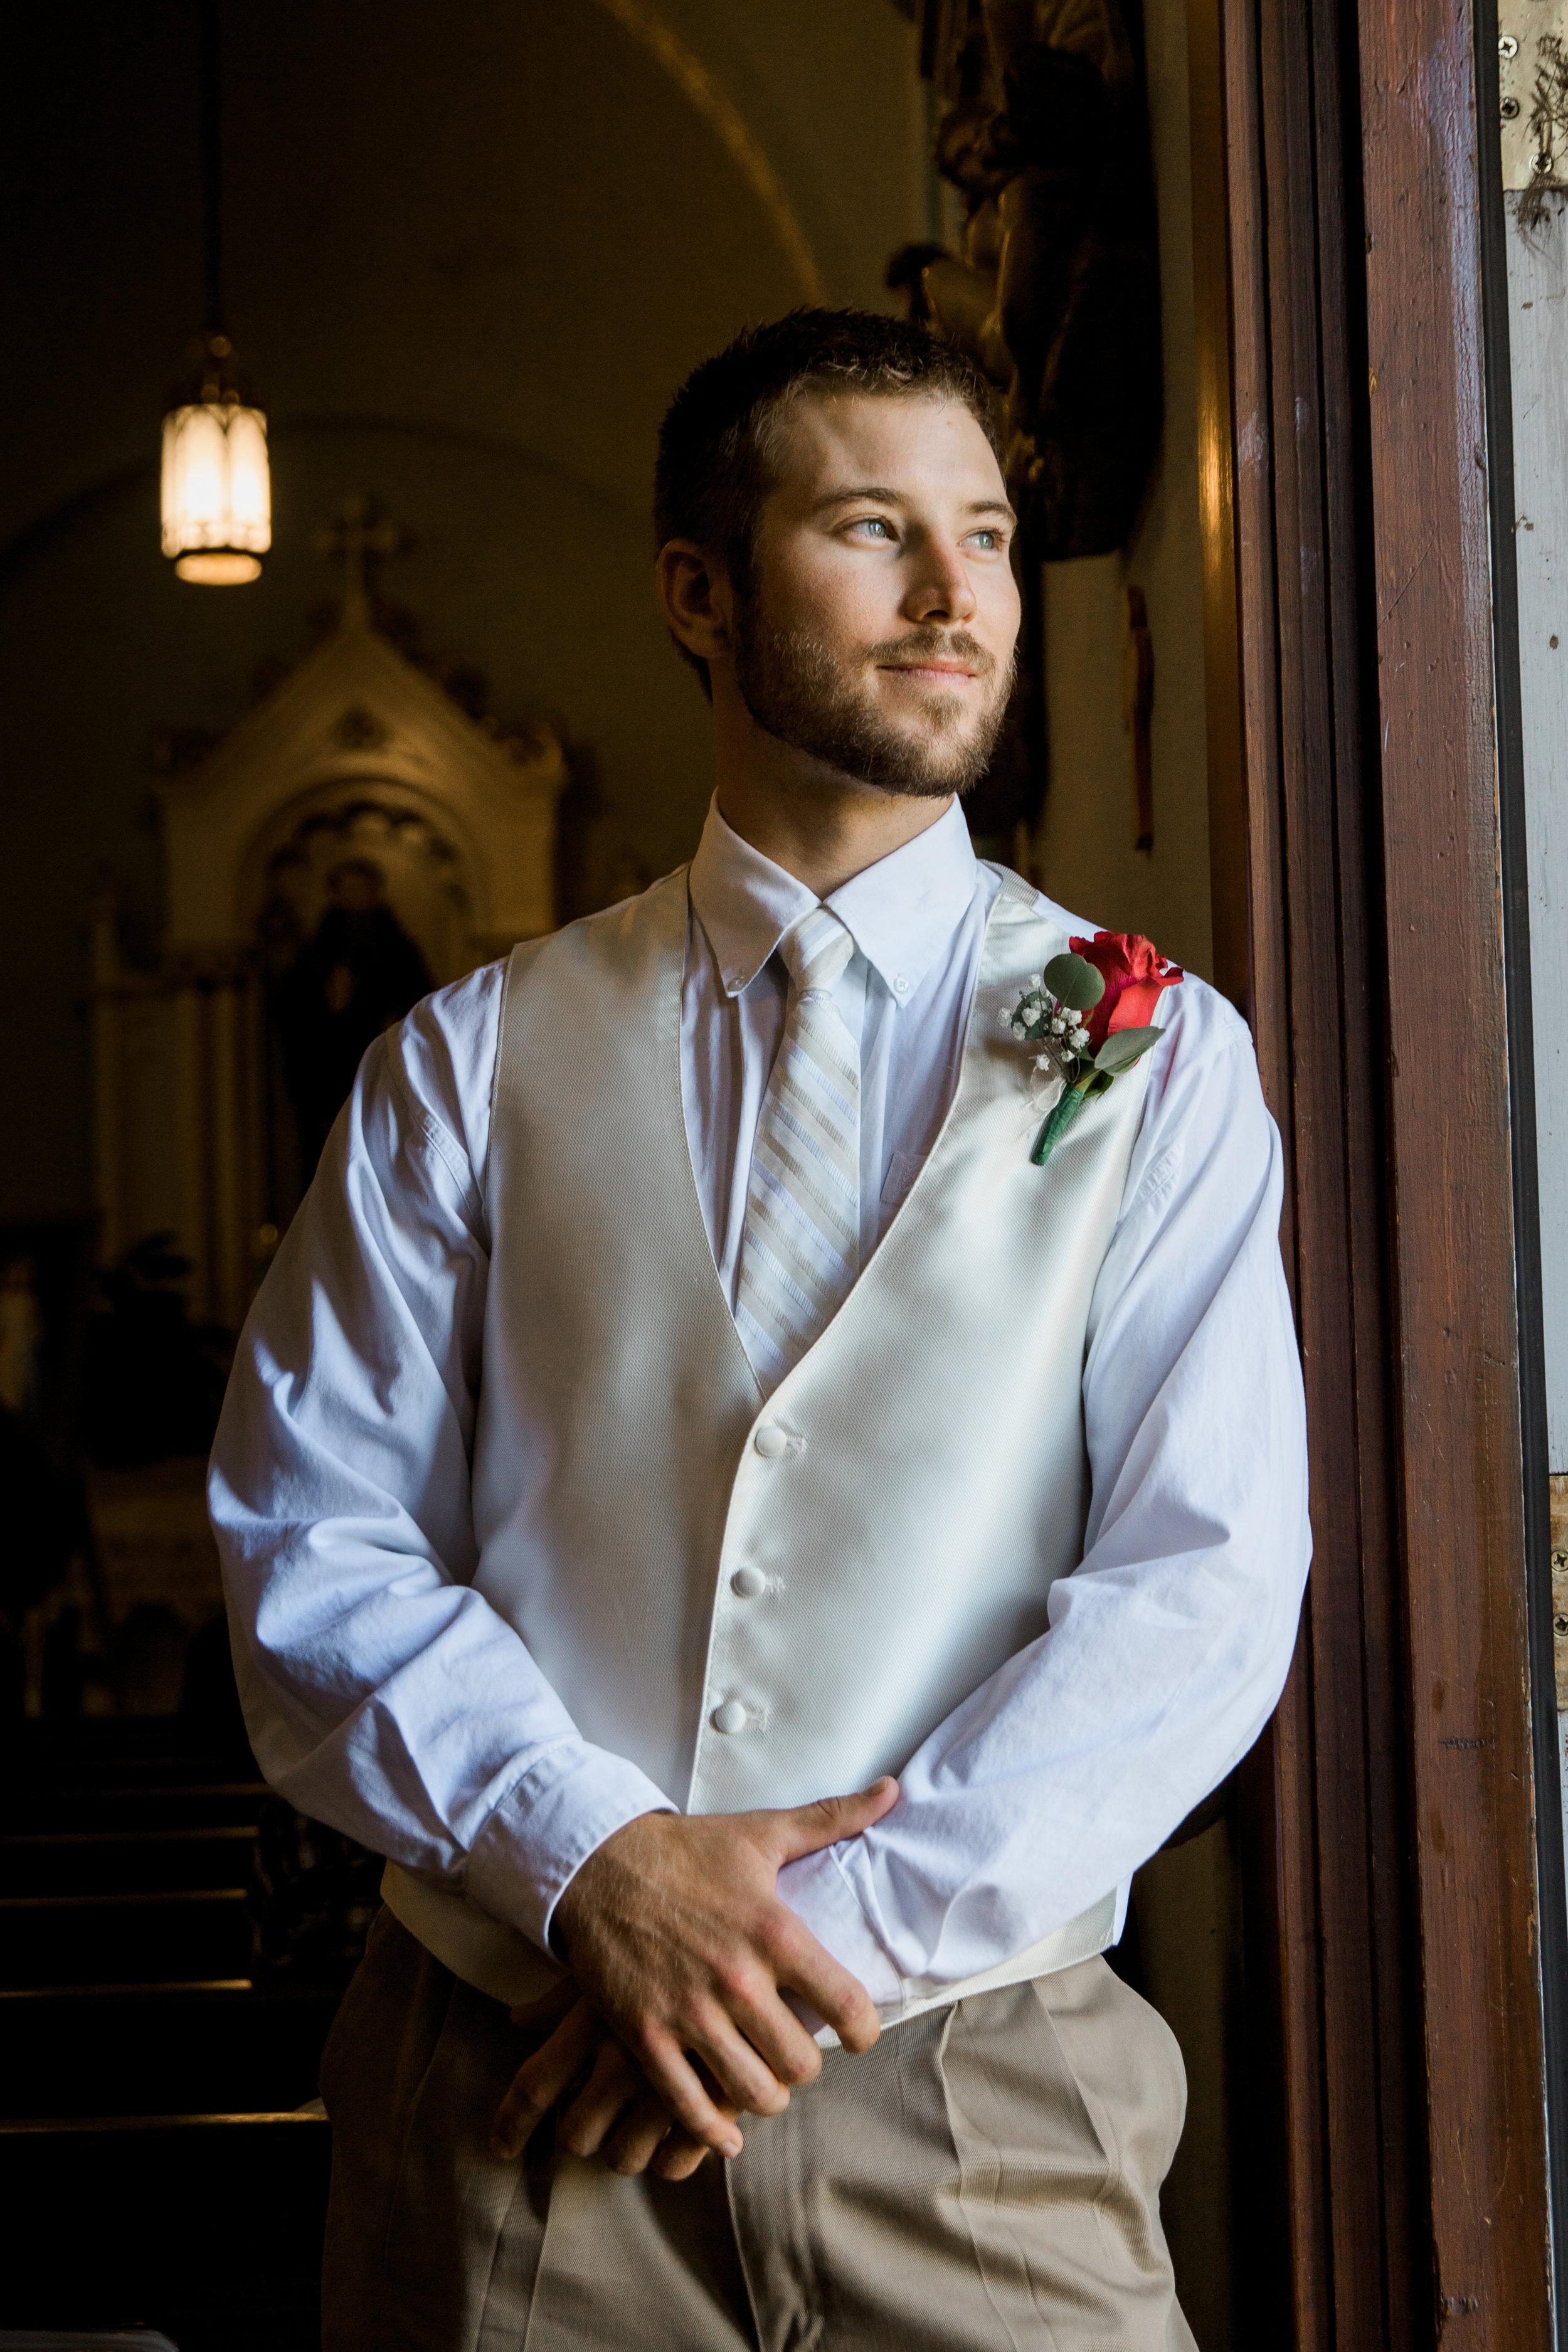 Bailey-Nathan-Windthorst-Texas-Wedding-030.jpg